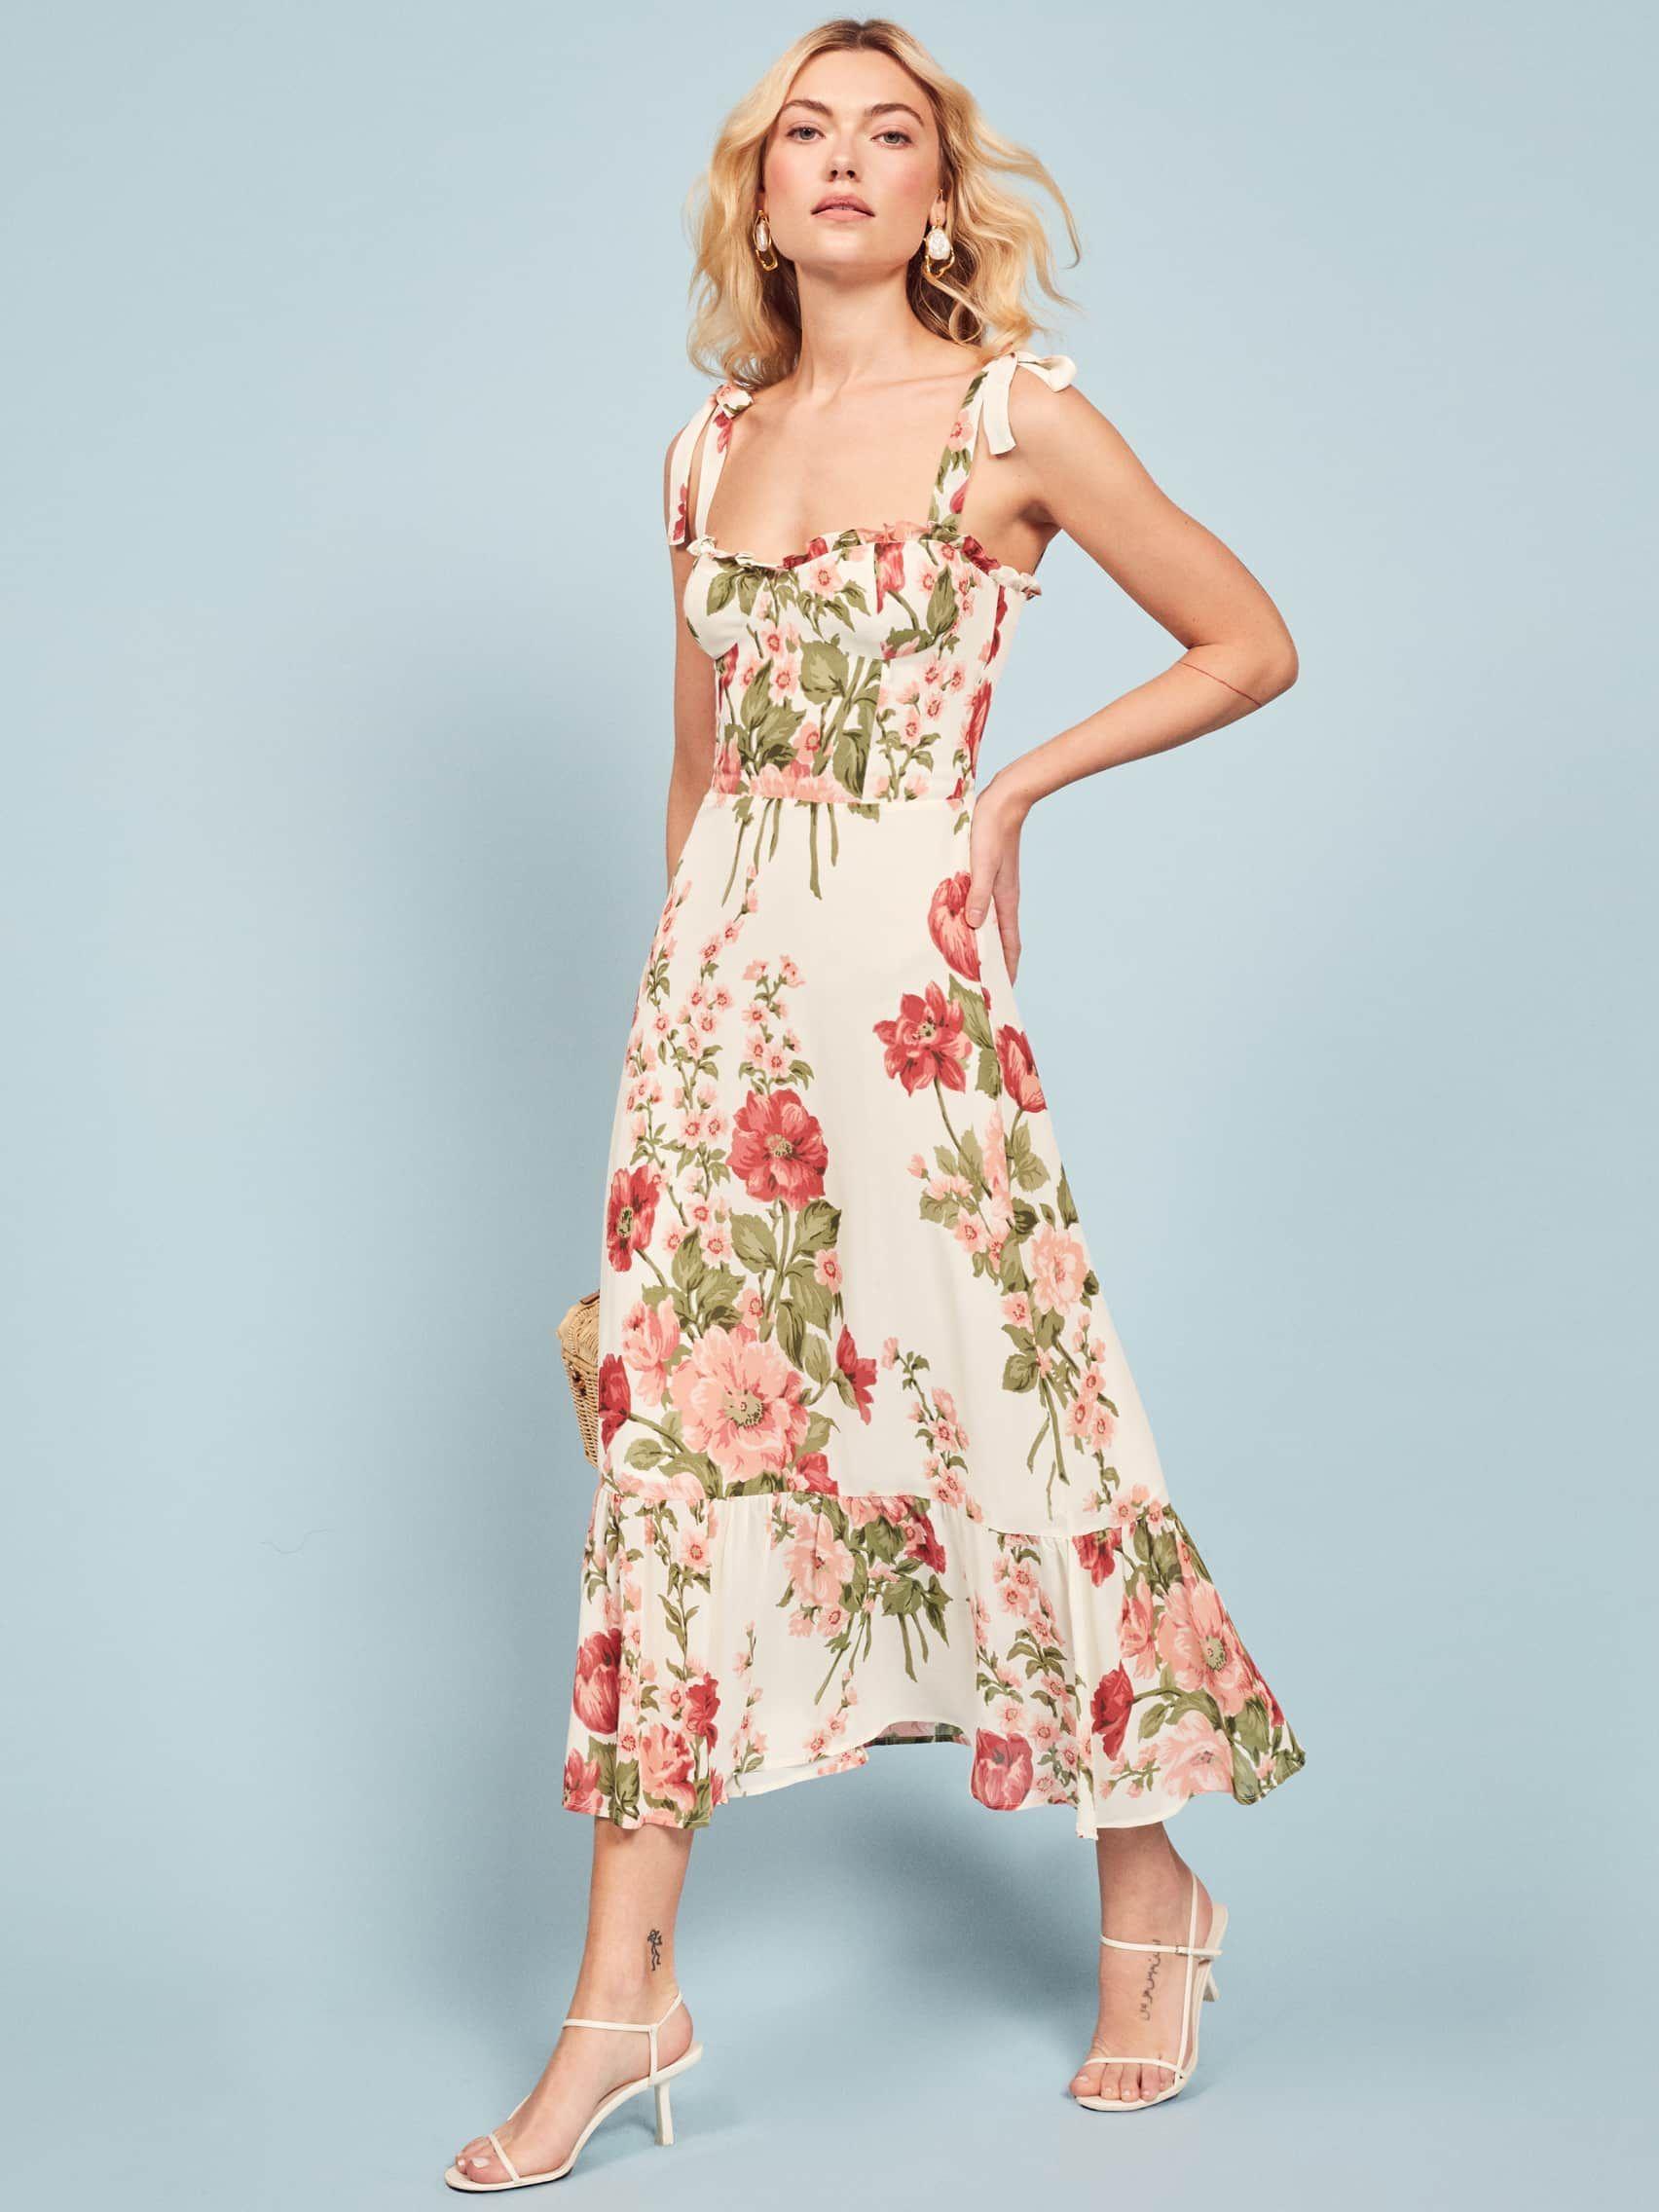 Nikita dress reformation dress dresses midi ruffle dress